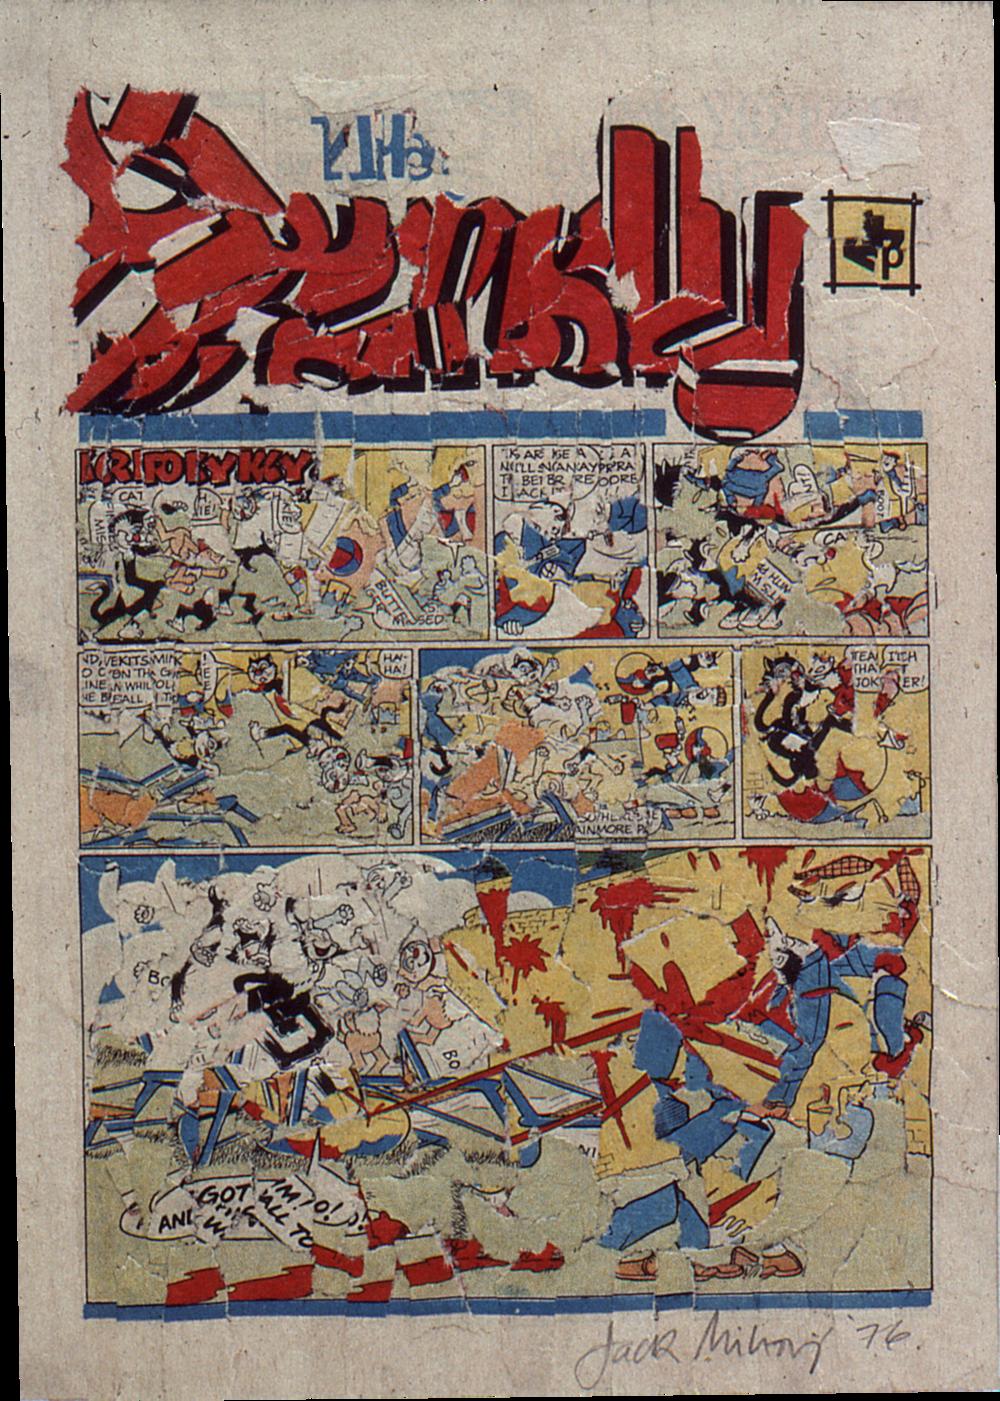 Dandy 1, 1976